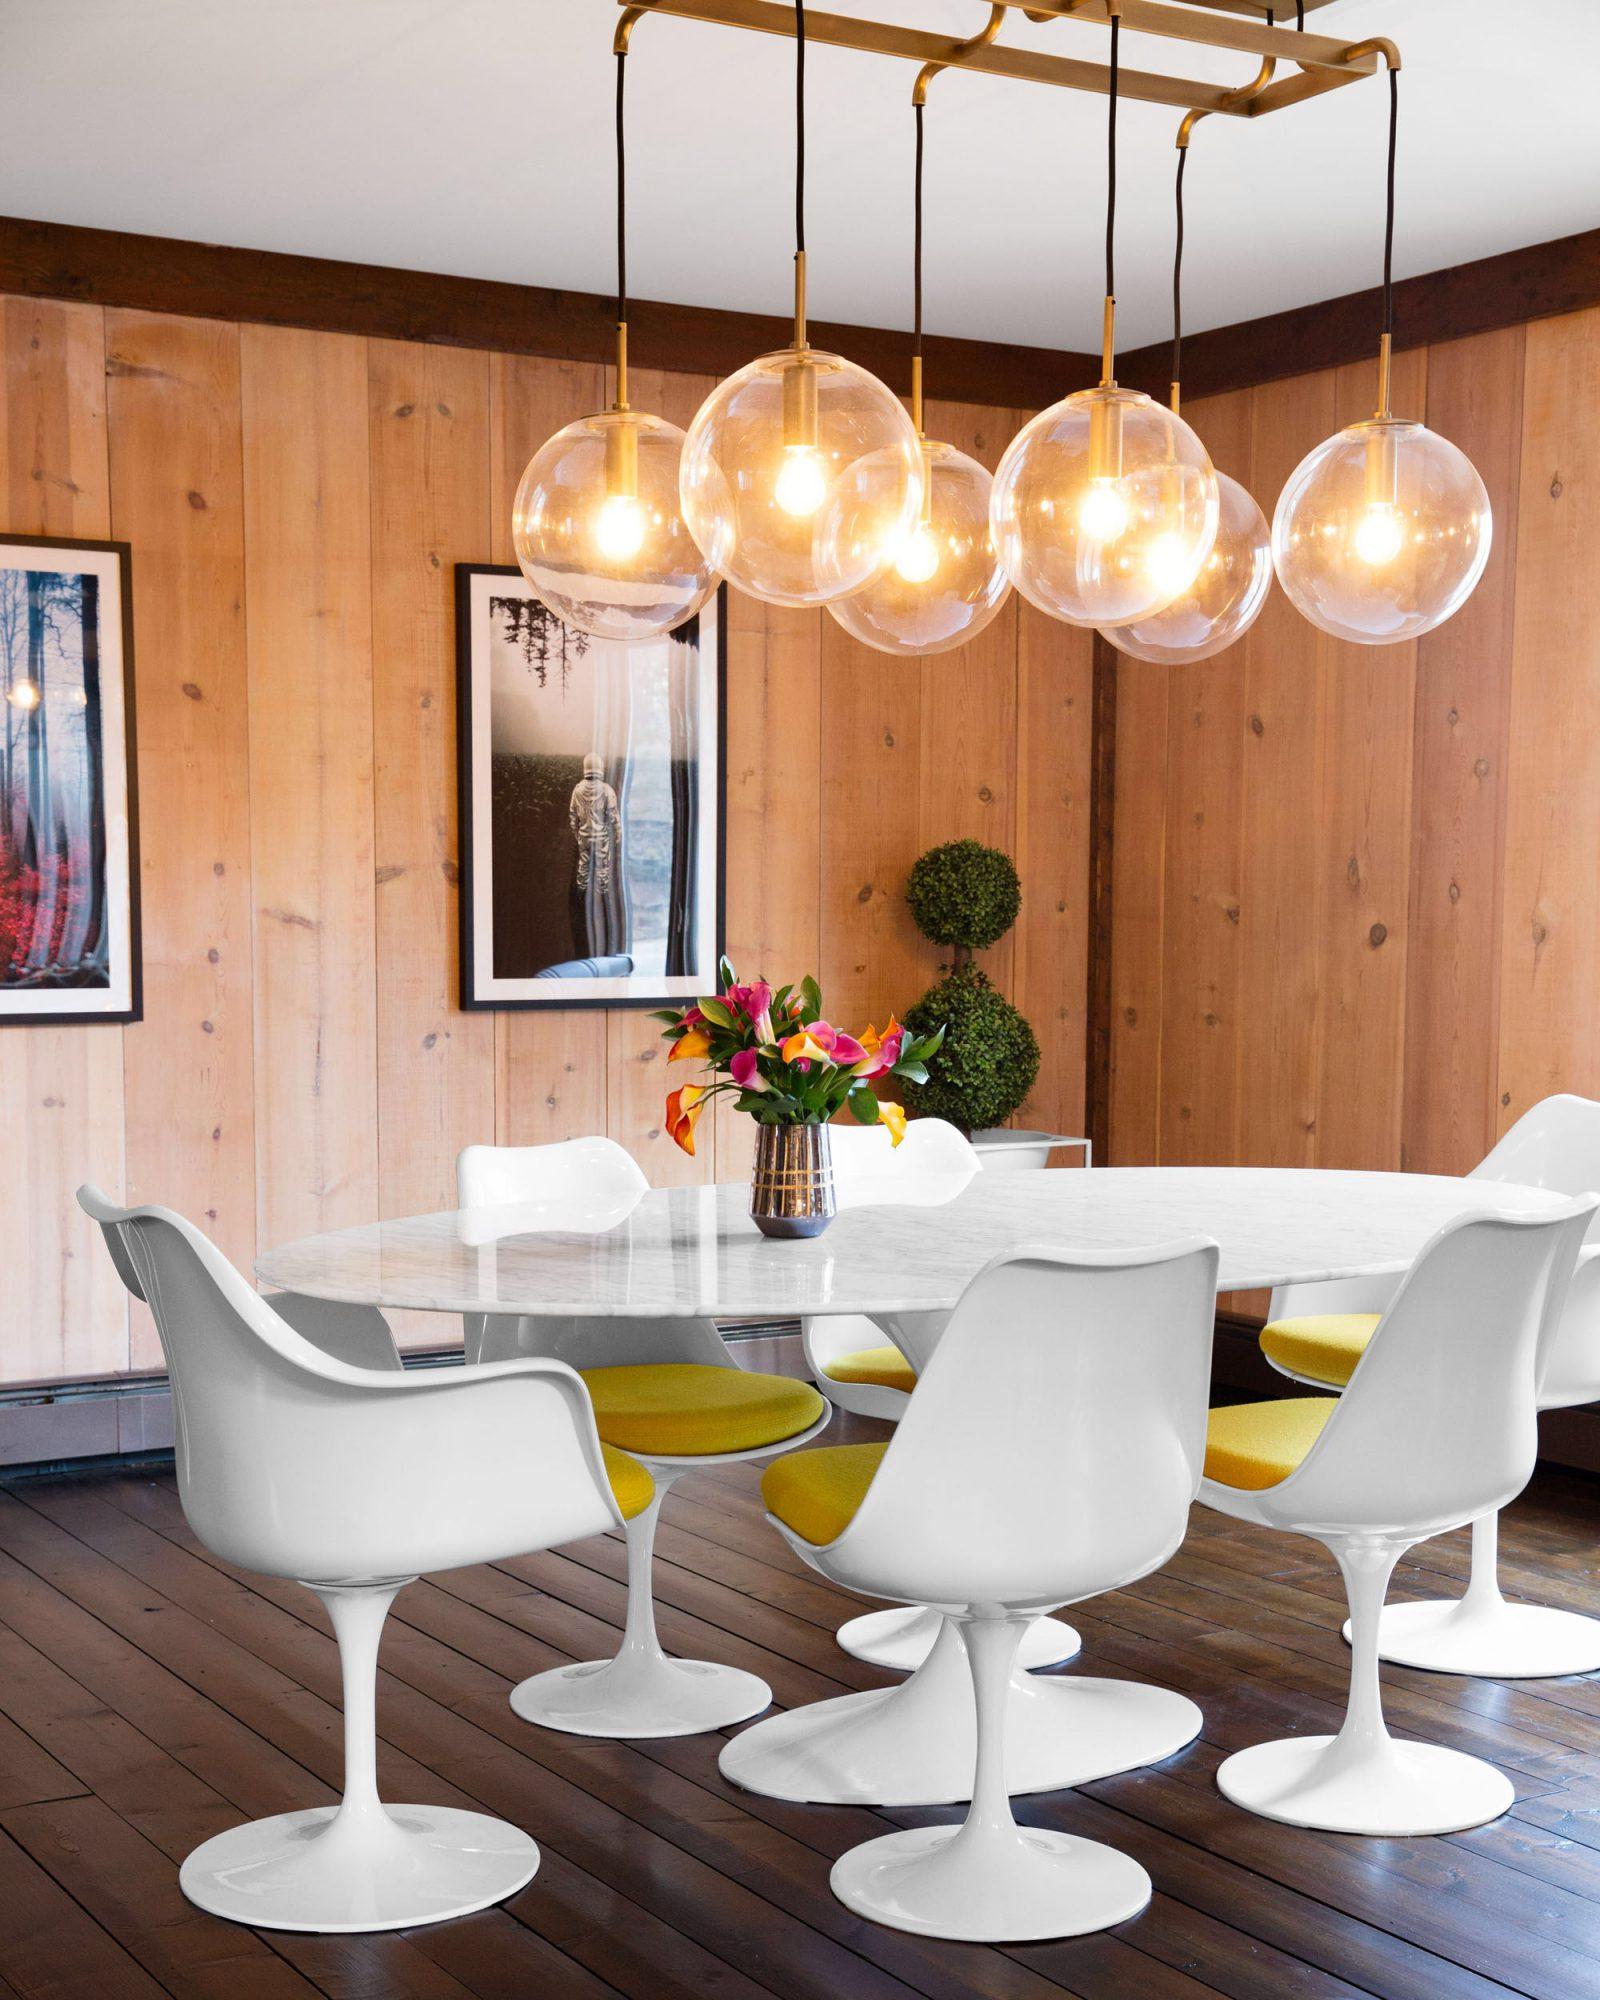 modern dining room globe lights yellow chairs